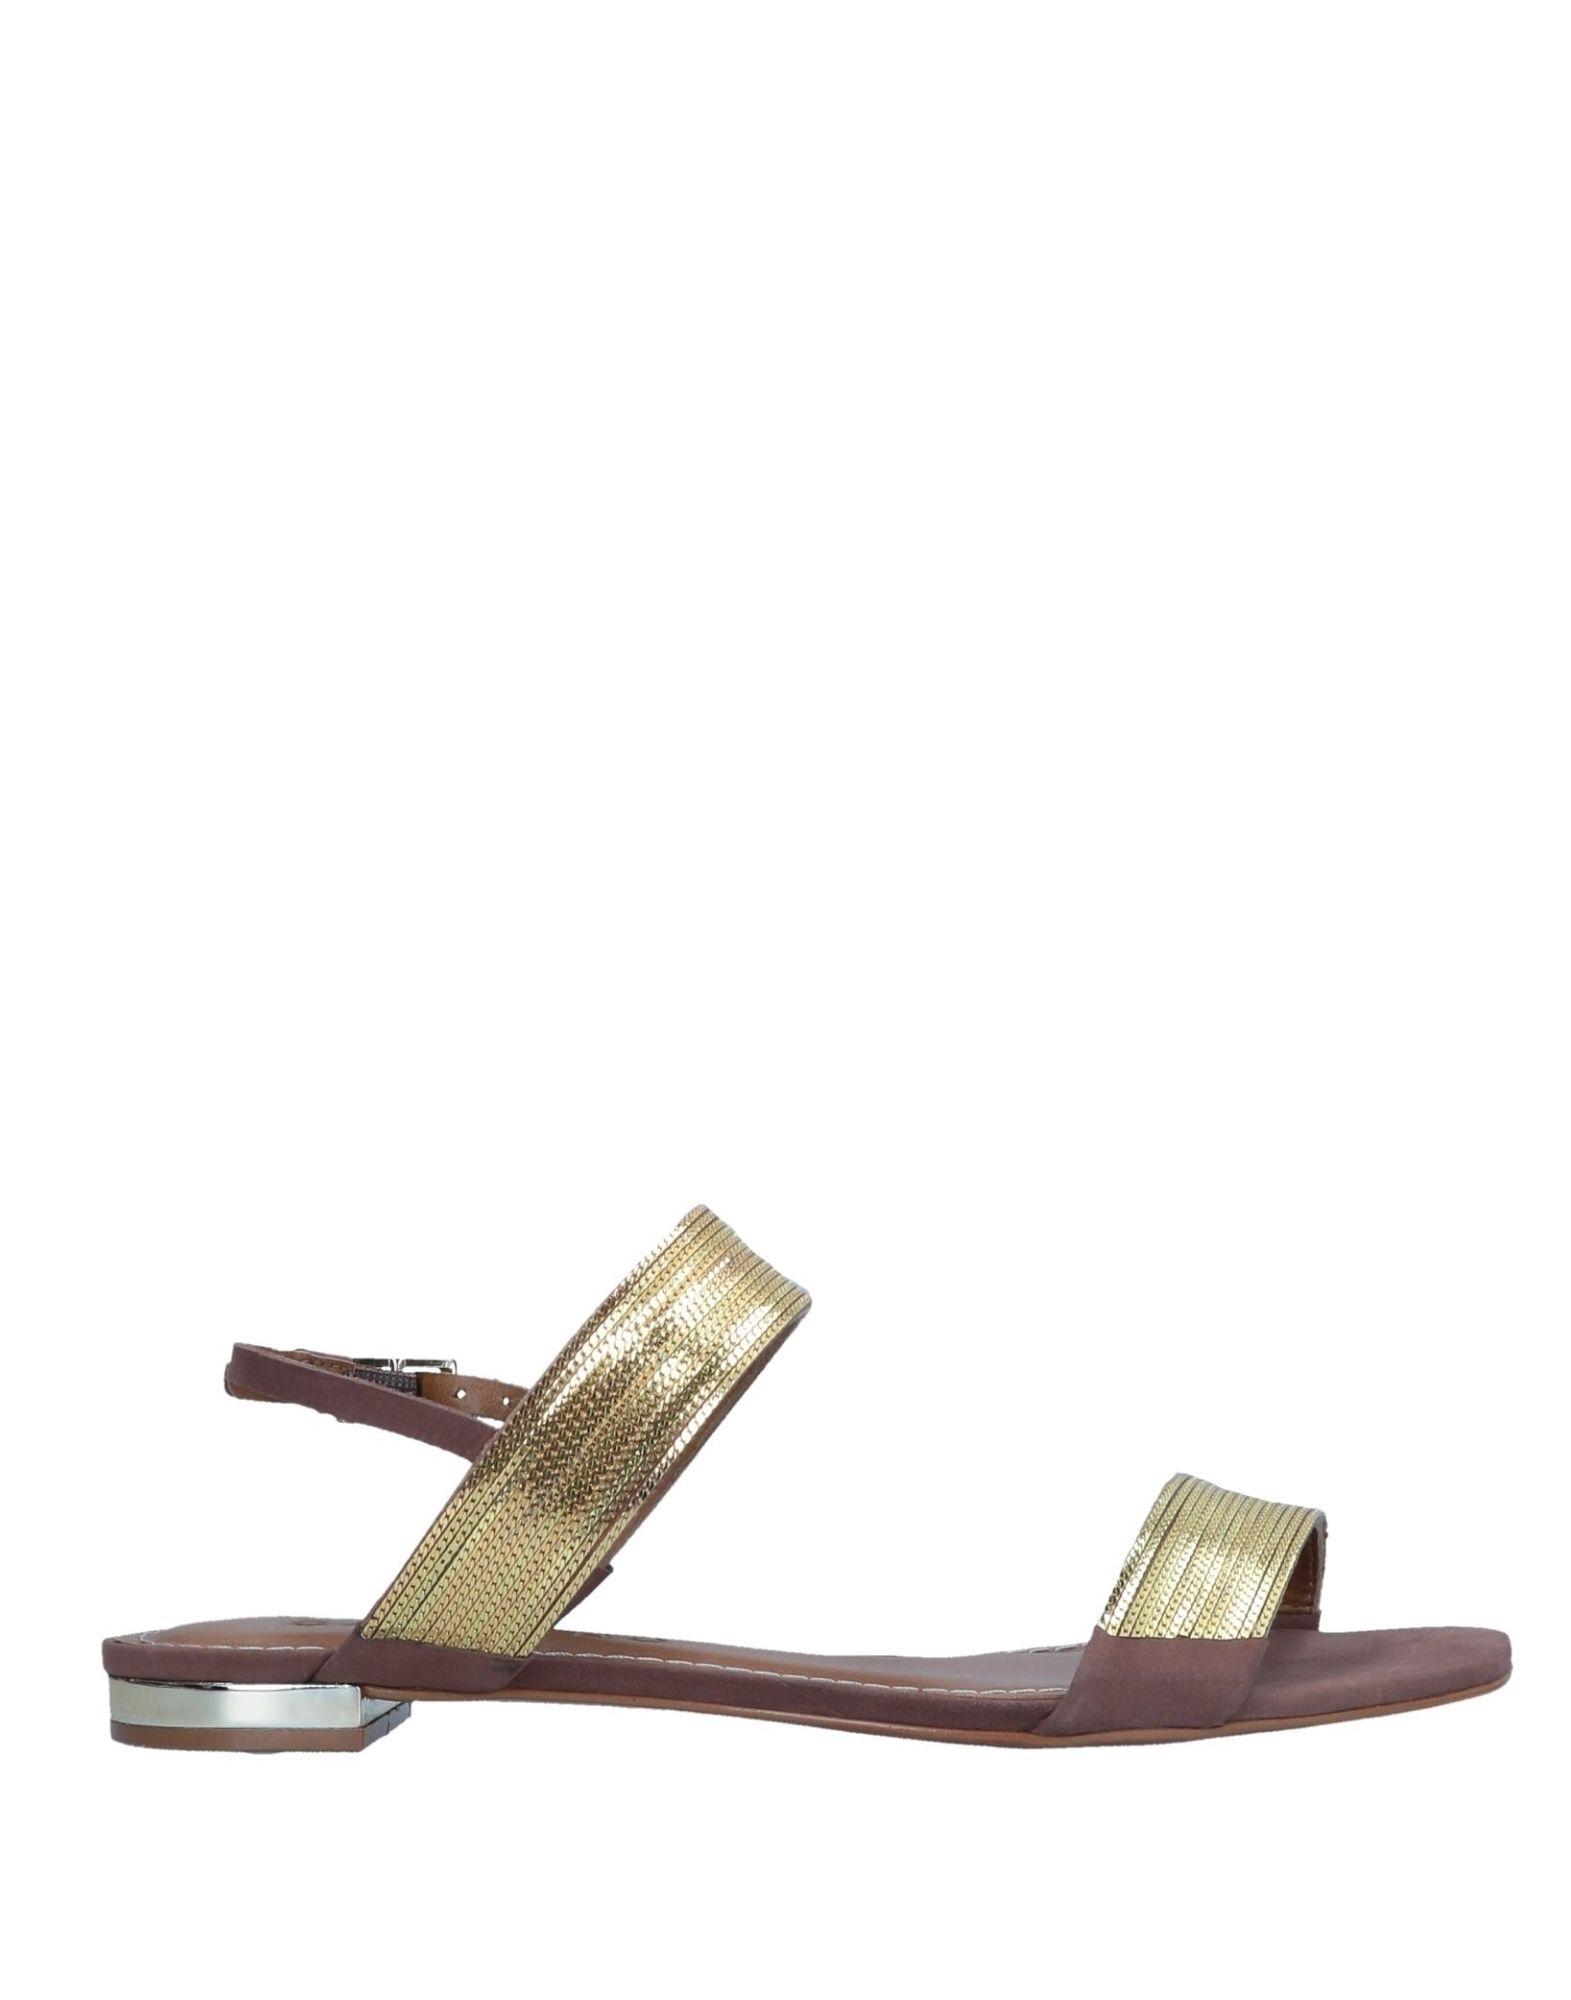 Carrano Sandalen Damen  11548949MT Gute Qualität beliebte Schuhe